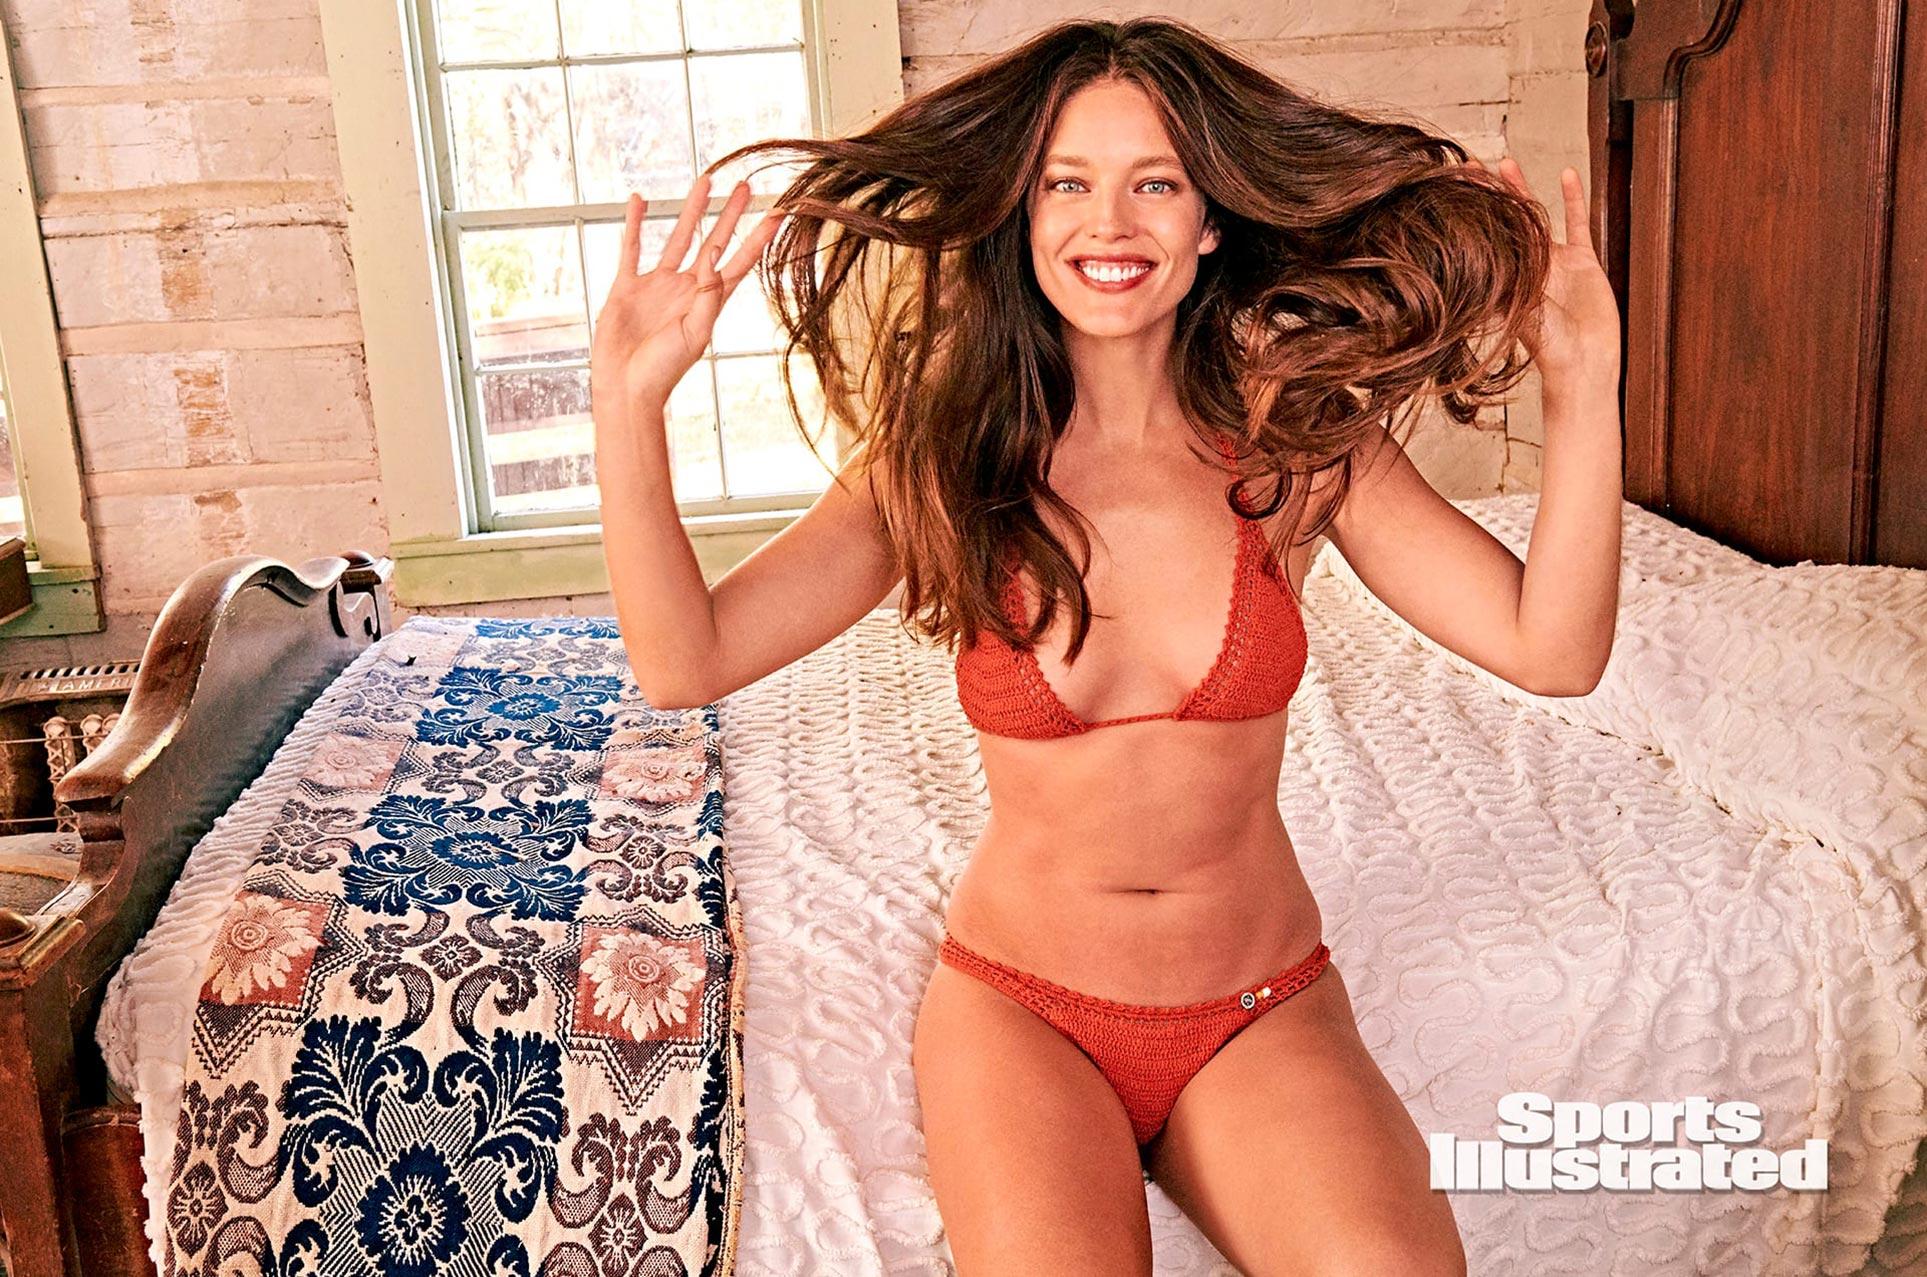 Эмили ДиДонато в каталоге купальников Sports Illustrated Swimsuit 2020 / фото 20